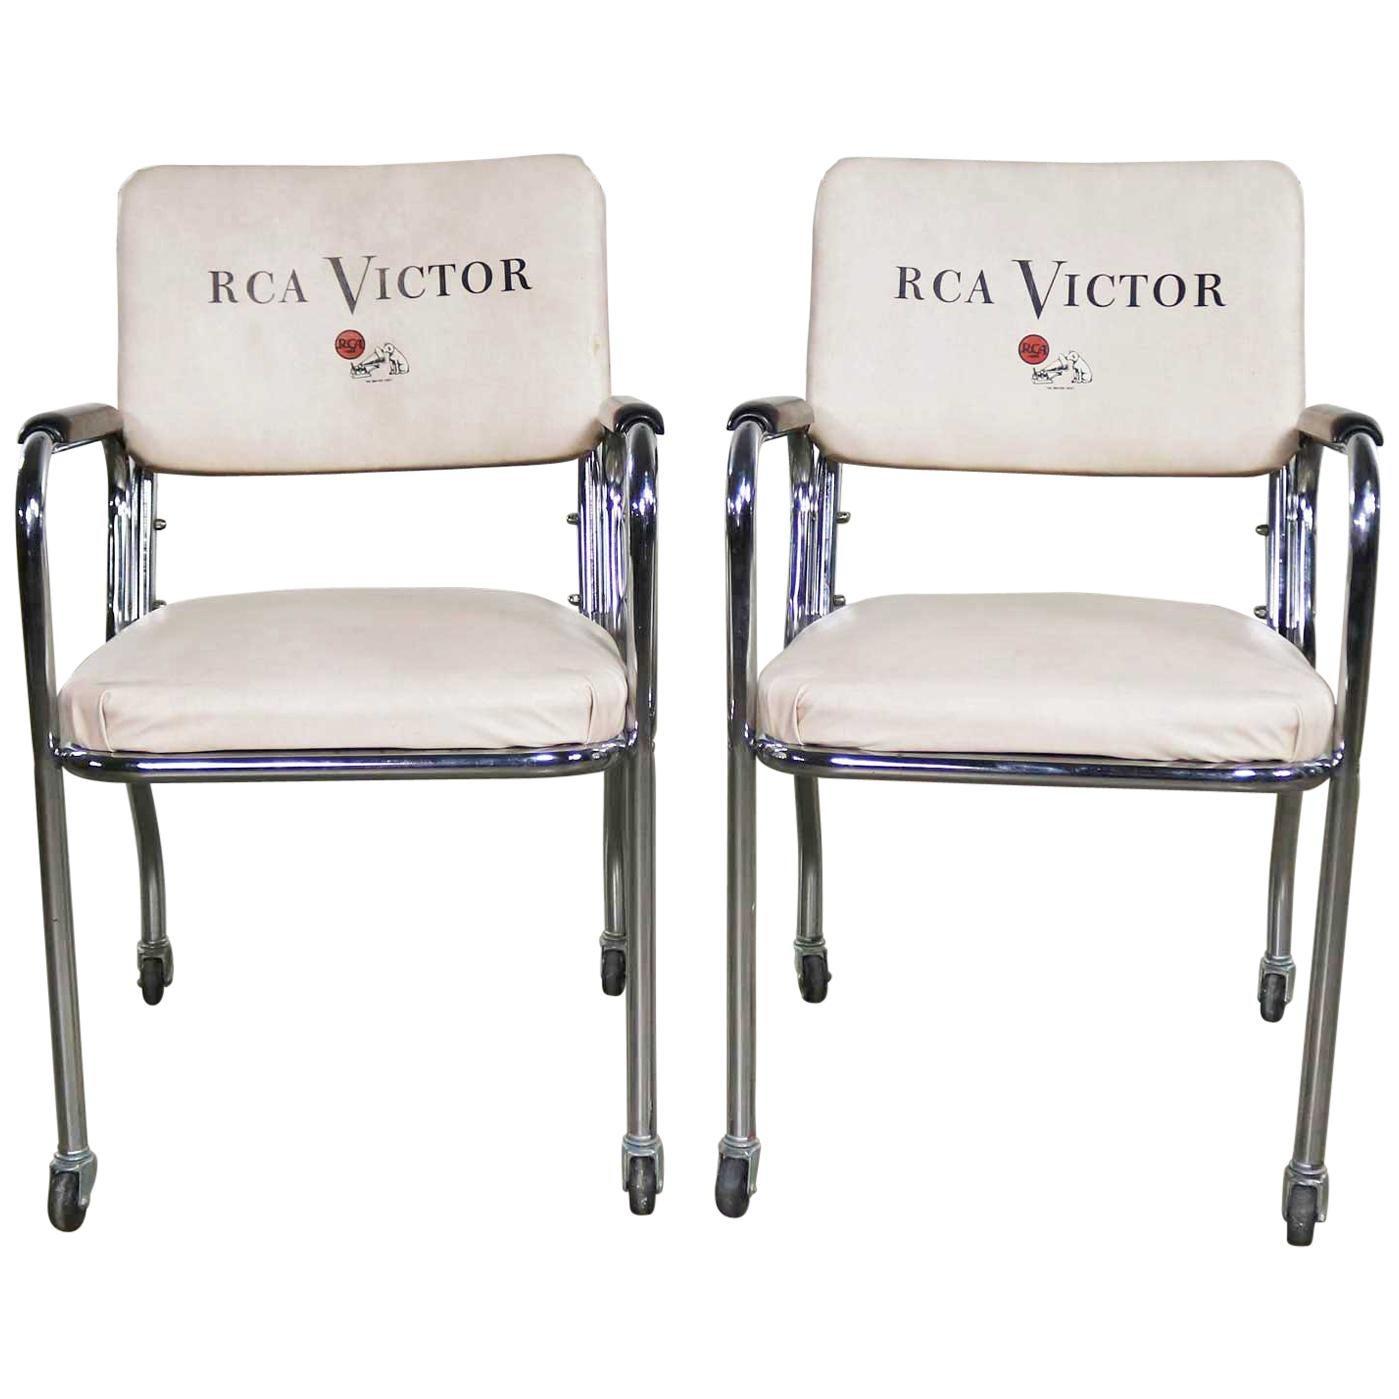 Pair of Art Deco Streamline Modern RCA Victor Chromcraft Advertising Chairs